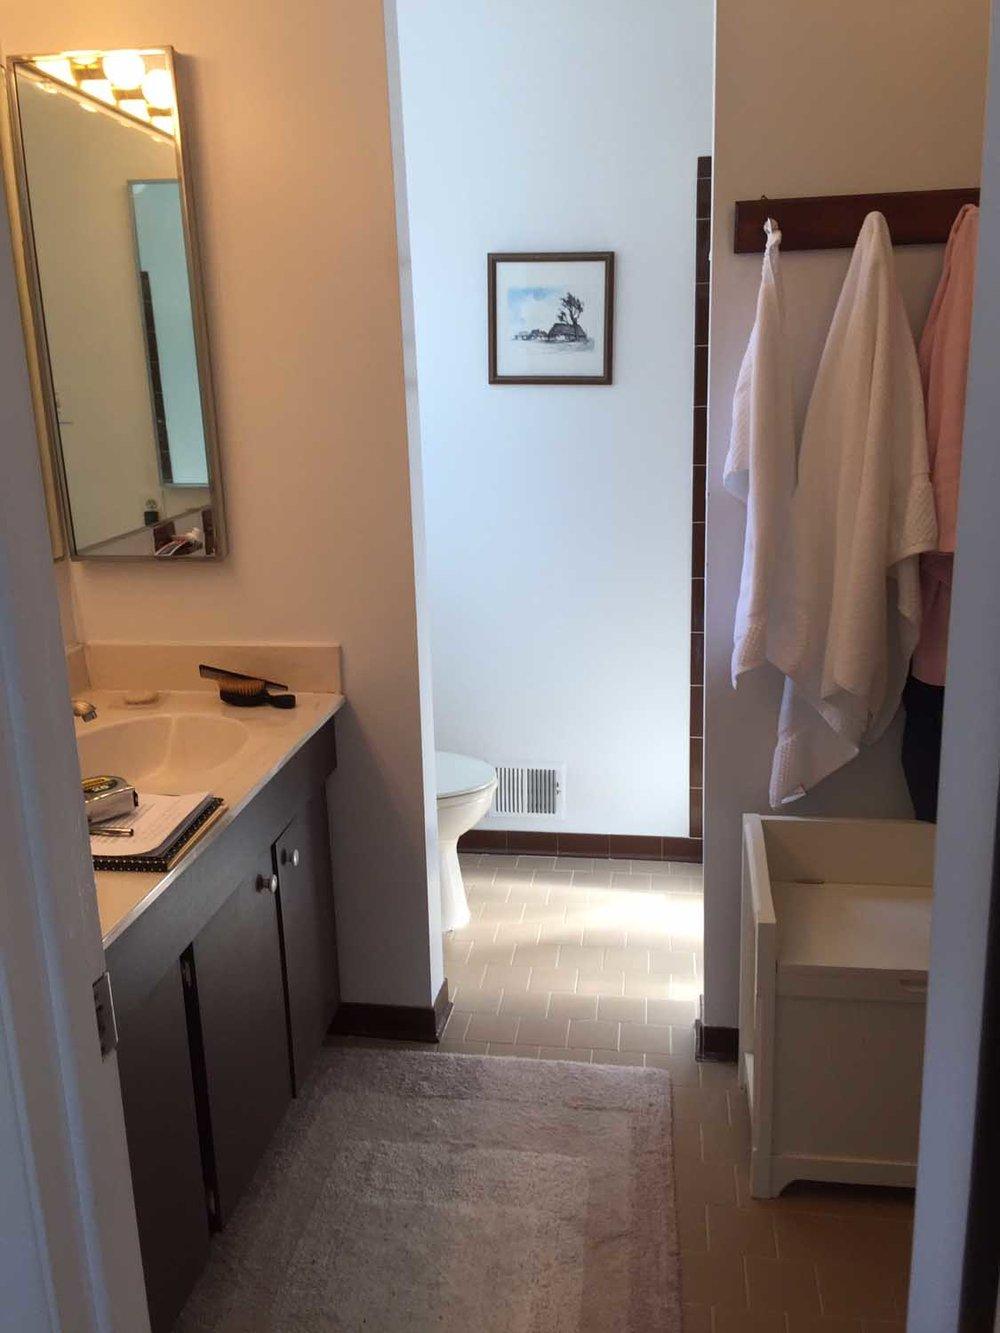 Columbia Maryland Outdated Master Bathroom Before Remodel – Designer Bestie April Force Pardoe Interiors.jpg